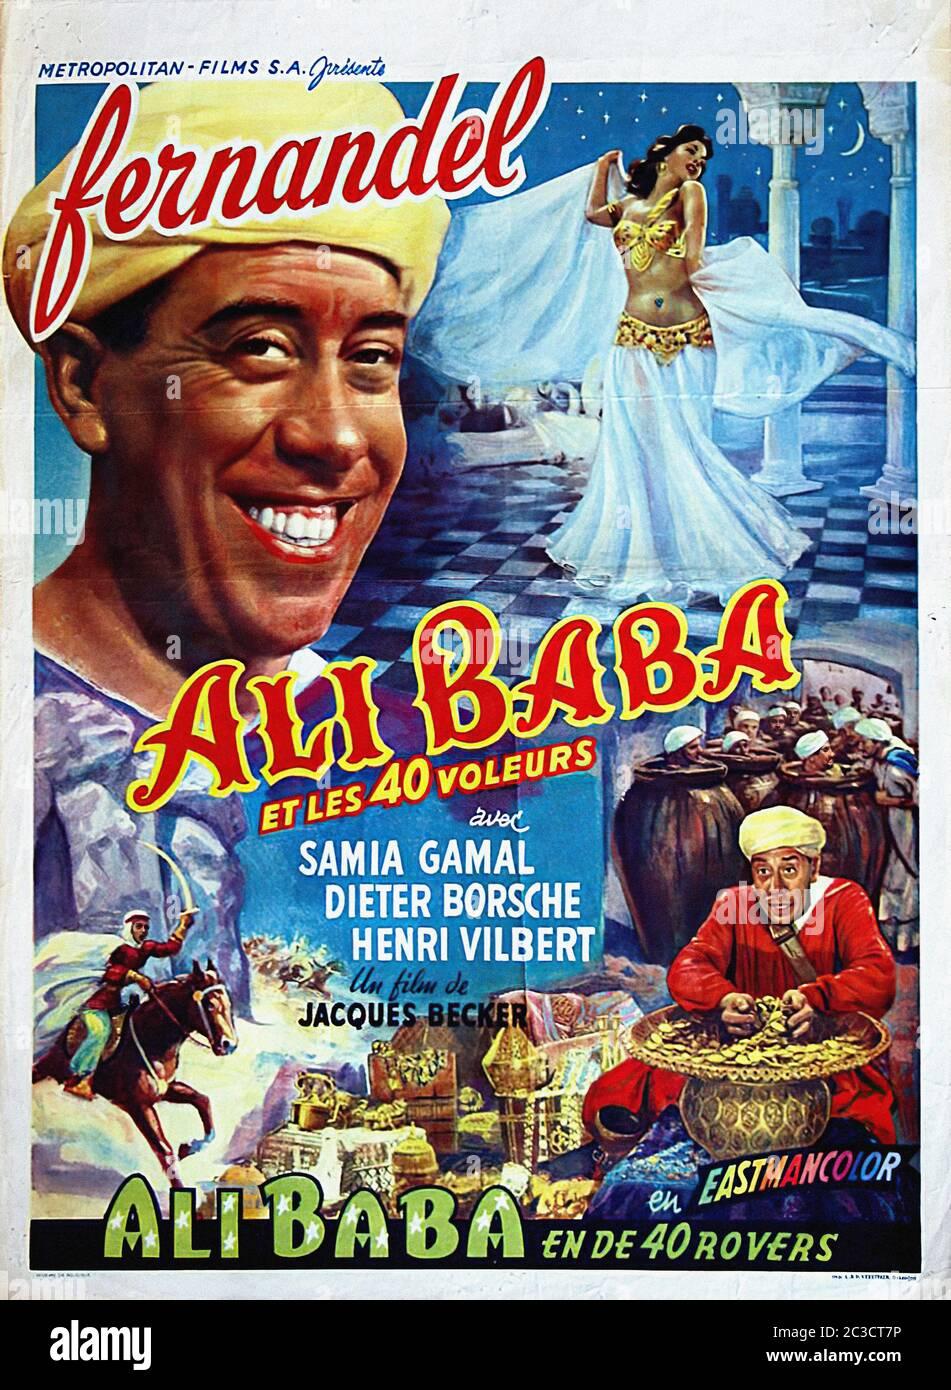 Ali Baba Et Les 40 Voleurs Fernandel : voleurs, fernandel, Quarante, Voleurs, French, Vintage, Movie, Poster, Stock, Photo, Alamy